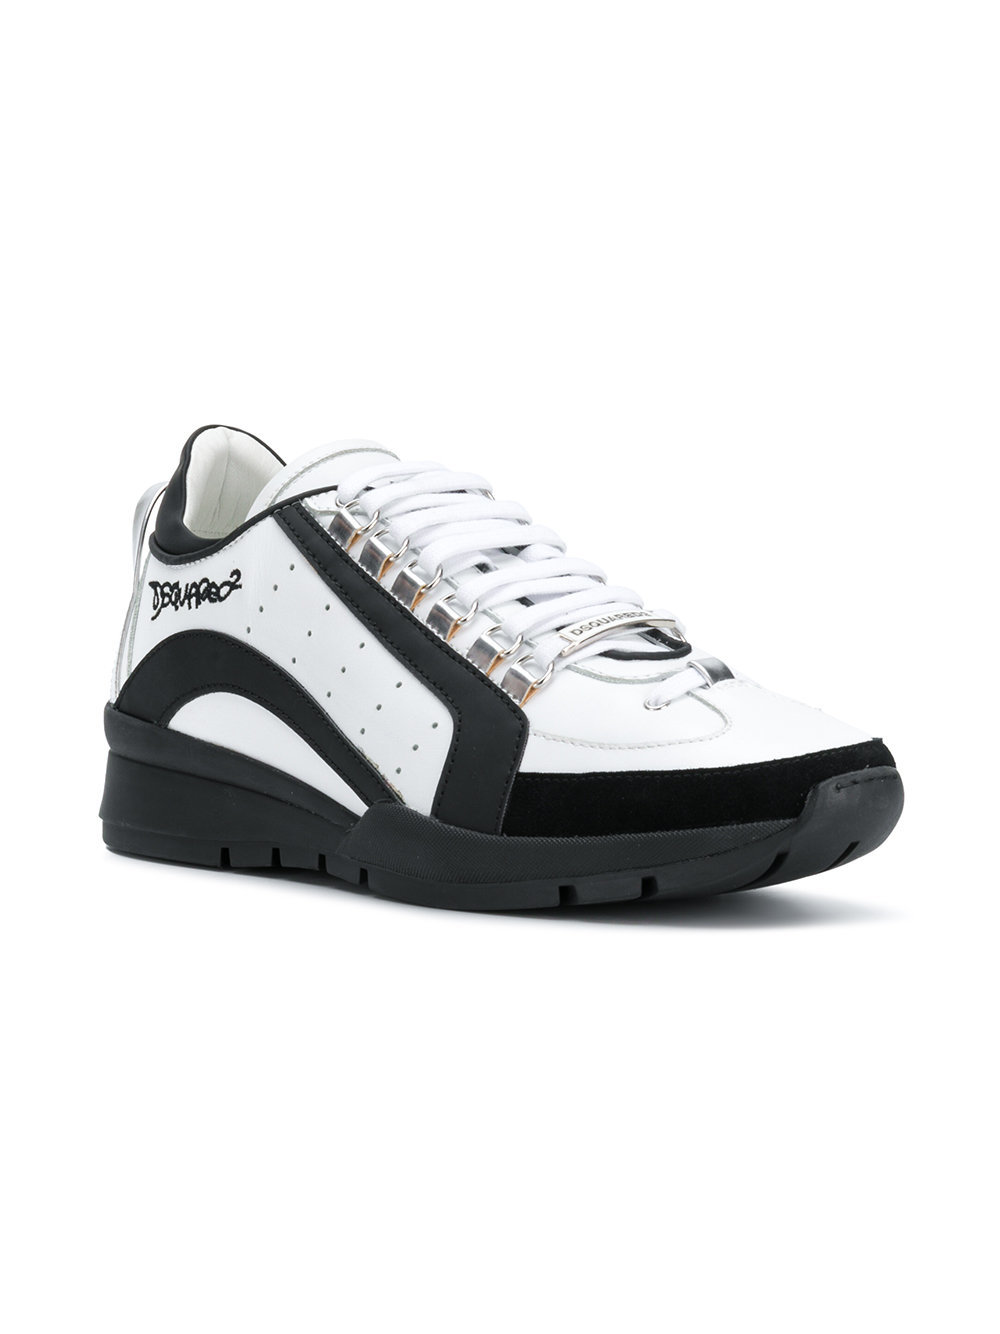 DSQUARED2 551 Sneakers, $400 | farfetch